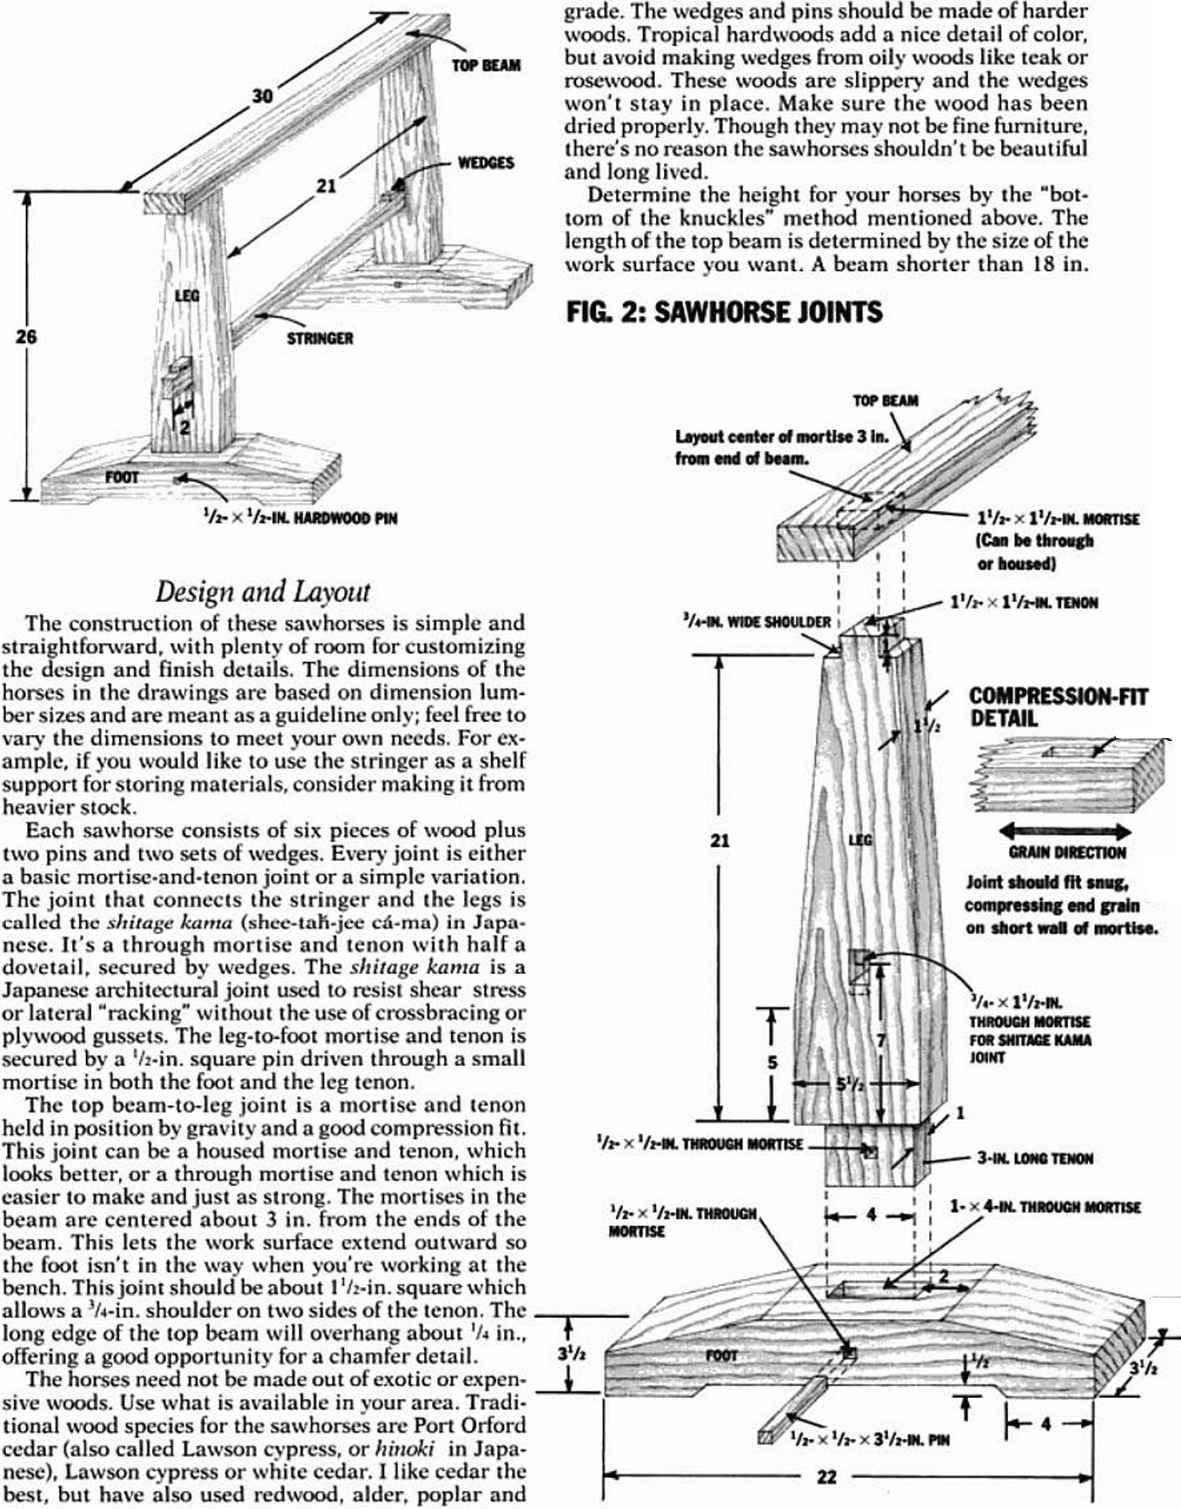 95 Buick Roadmaster Fuse Box Diagram